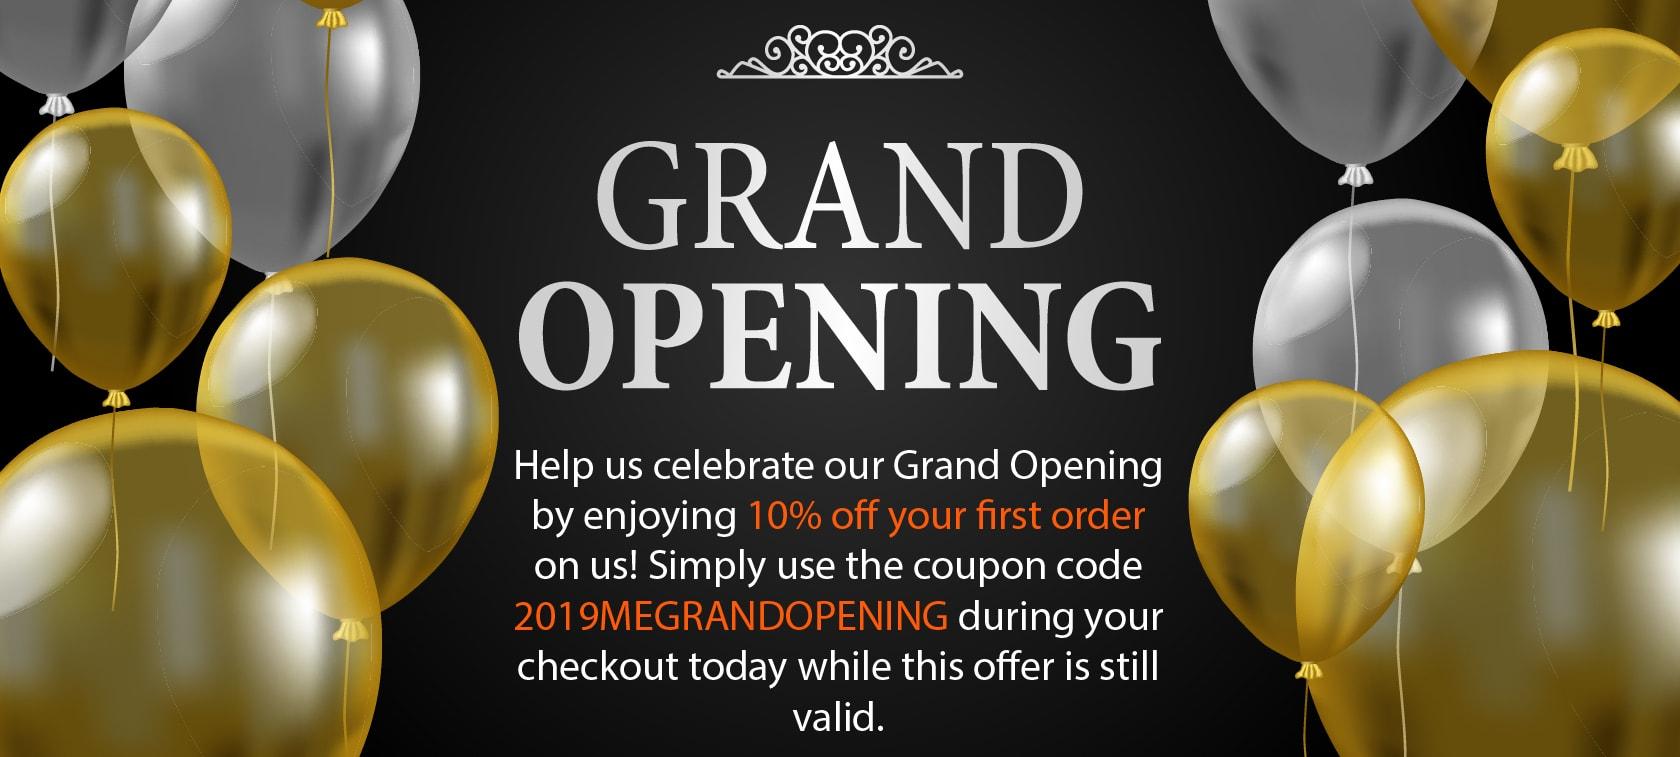 MageExchange Grand Opening!